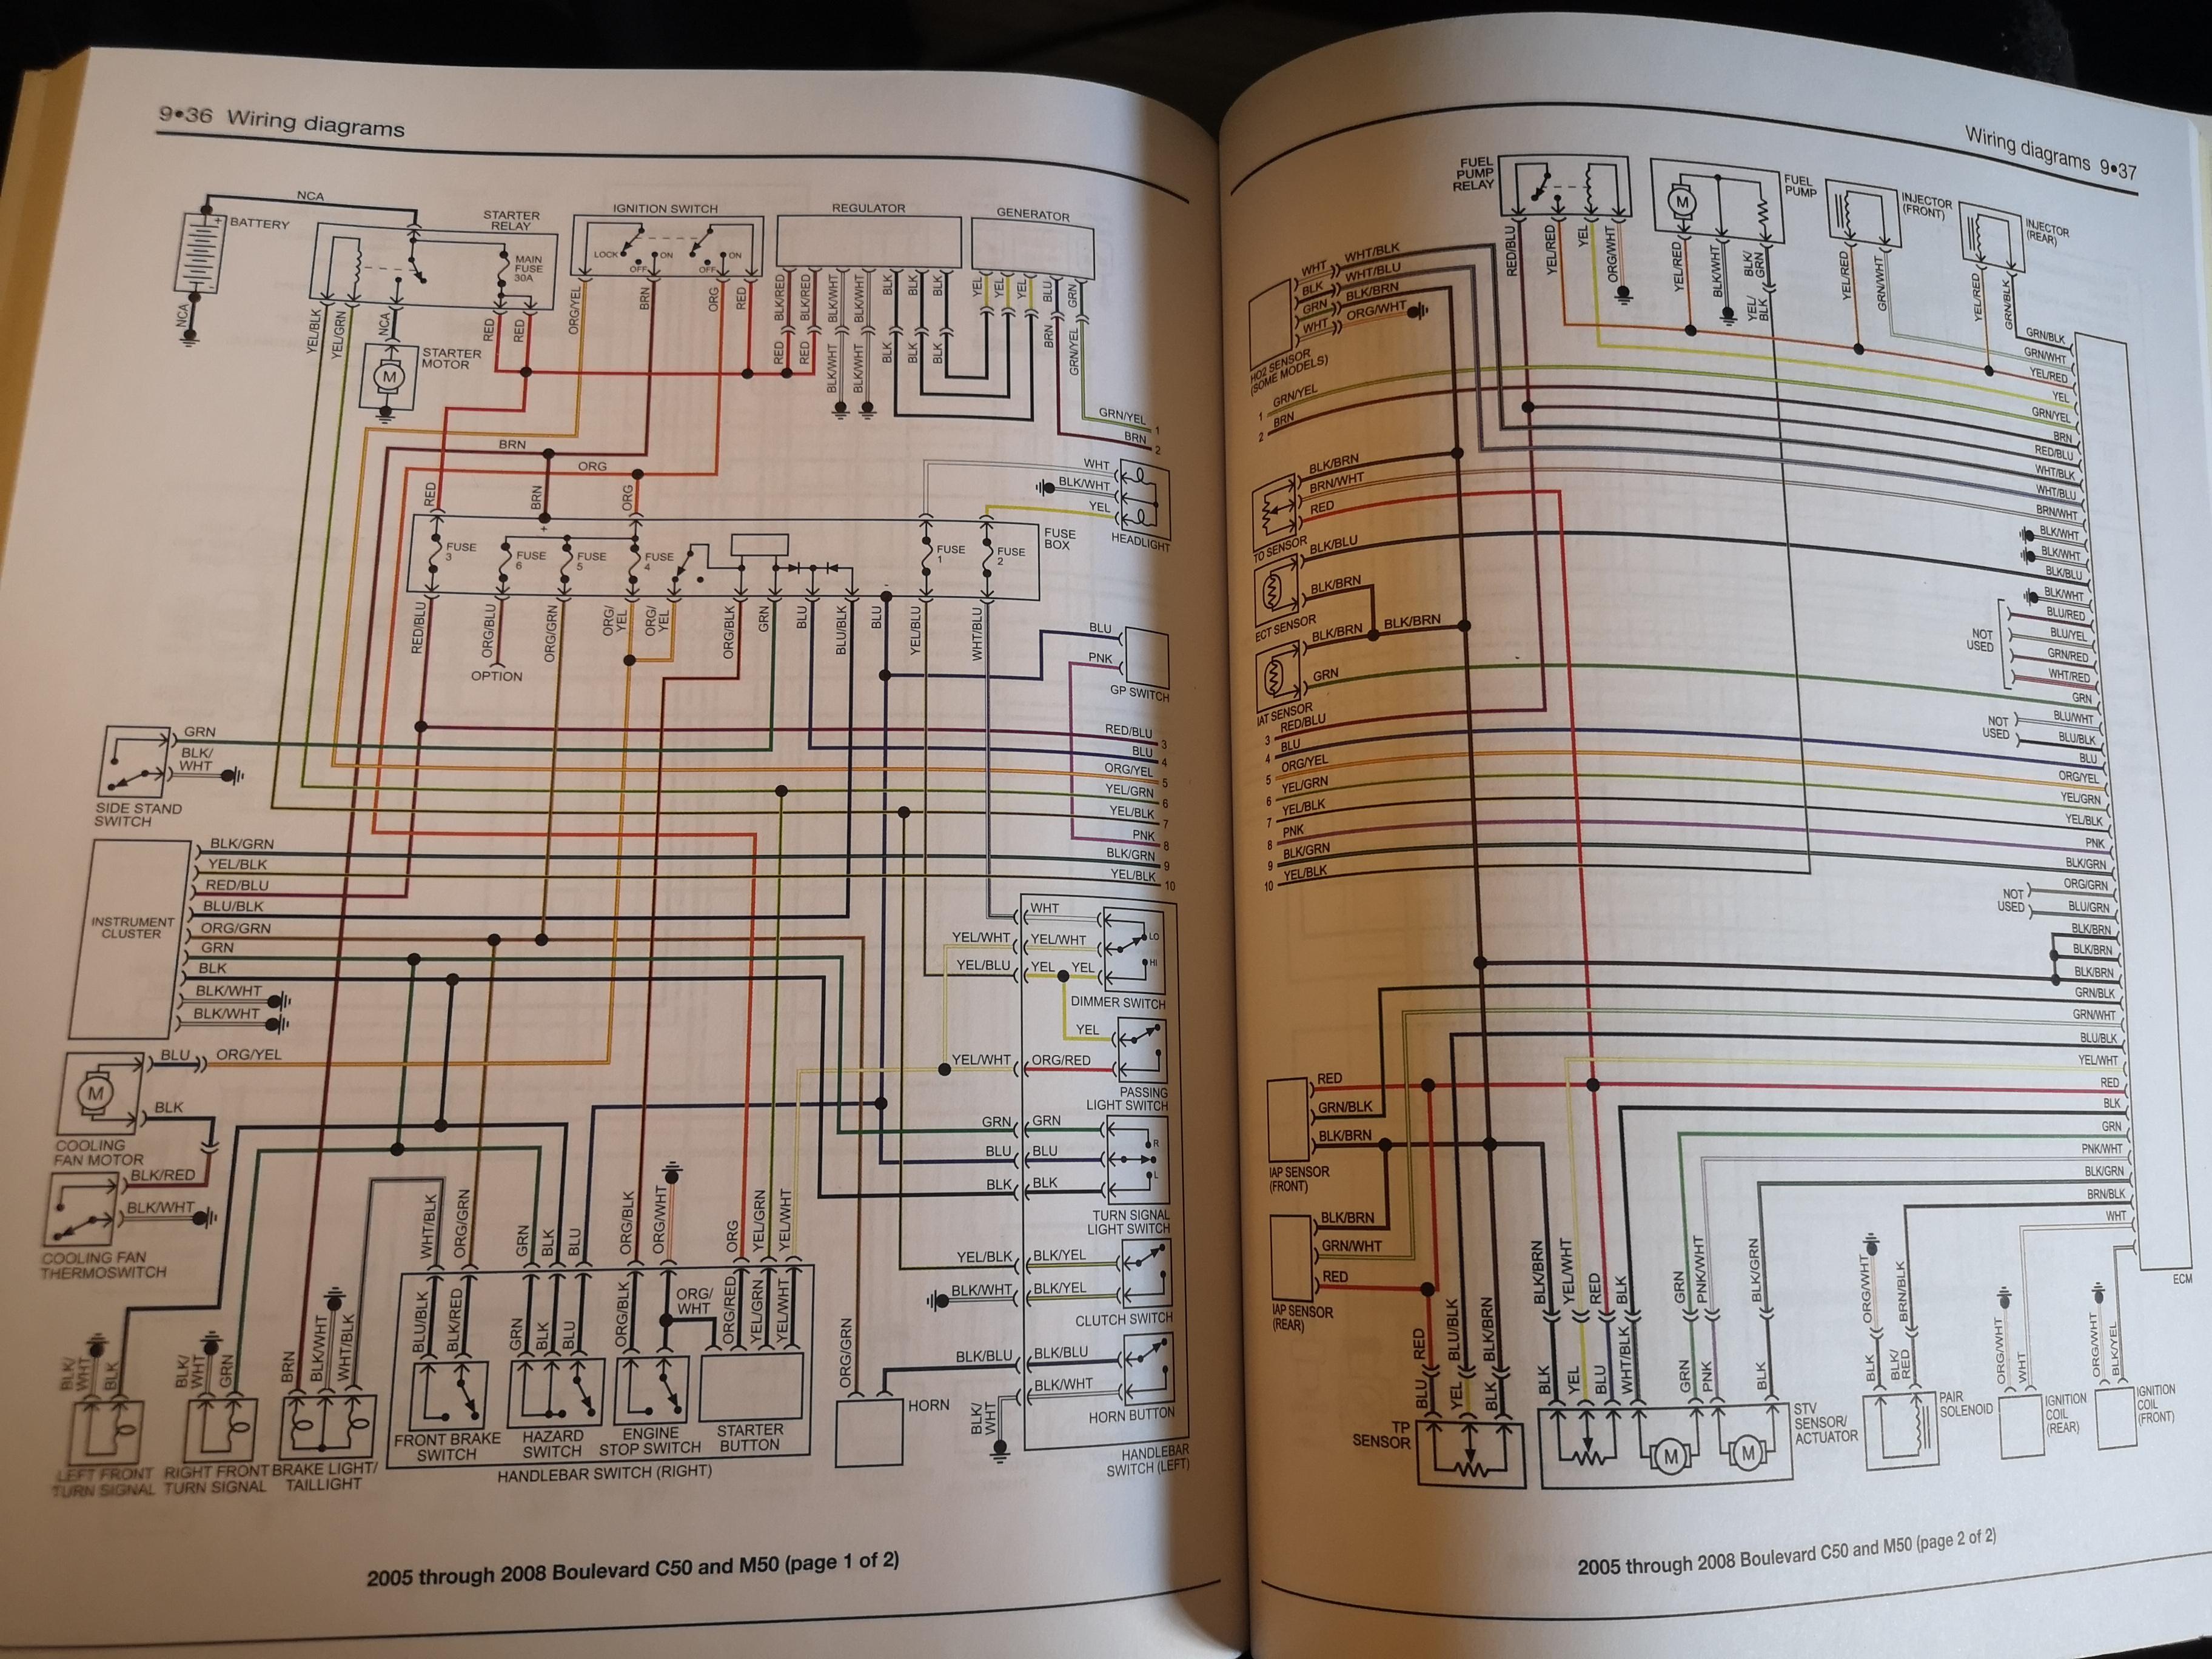 2005 suzuki boulevard c50 wiring diagram (colored) | Suzuki Volusia ForumSuzuki Volusia Forum